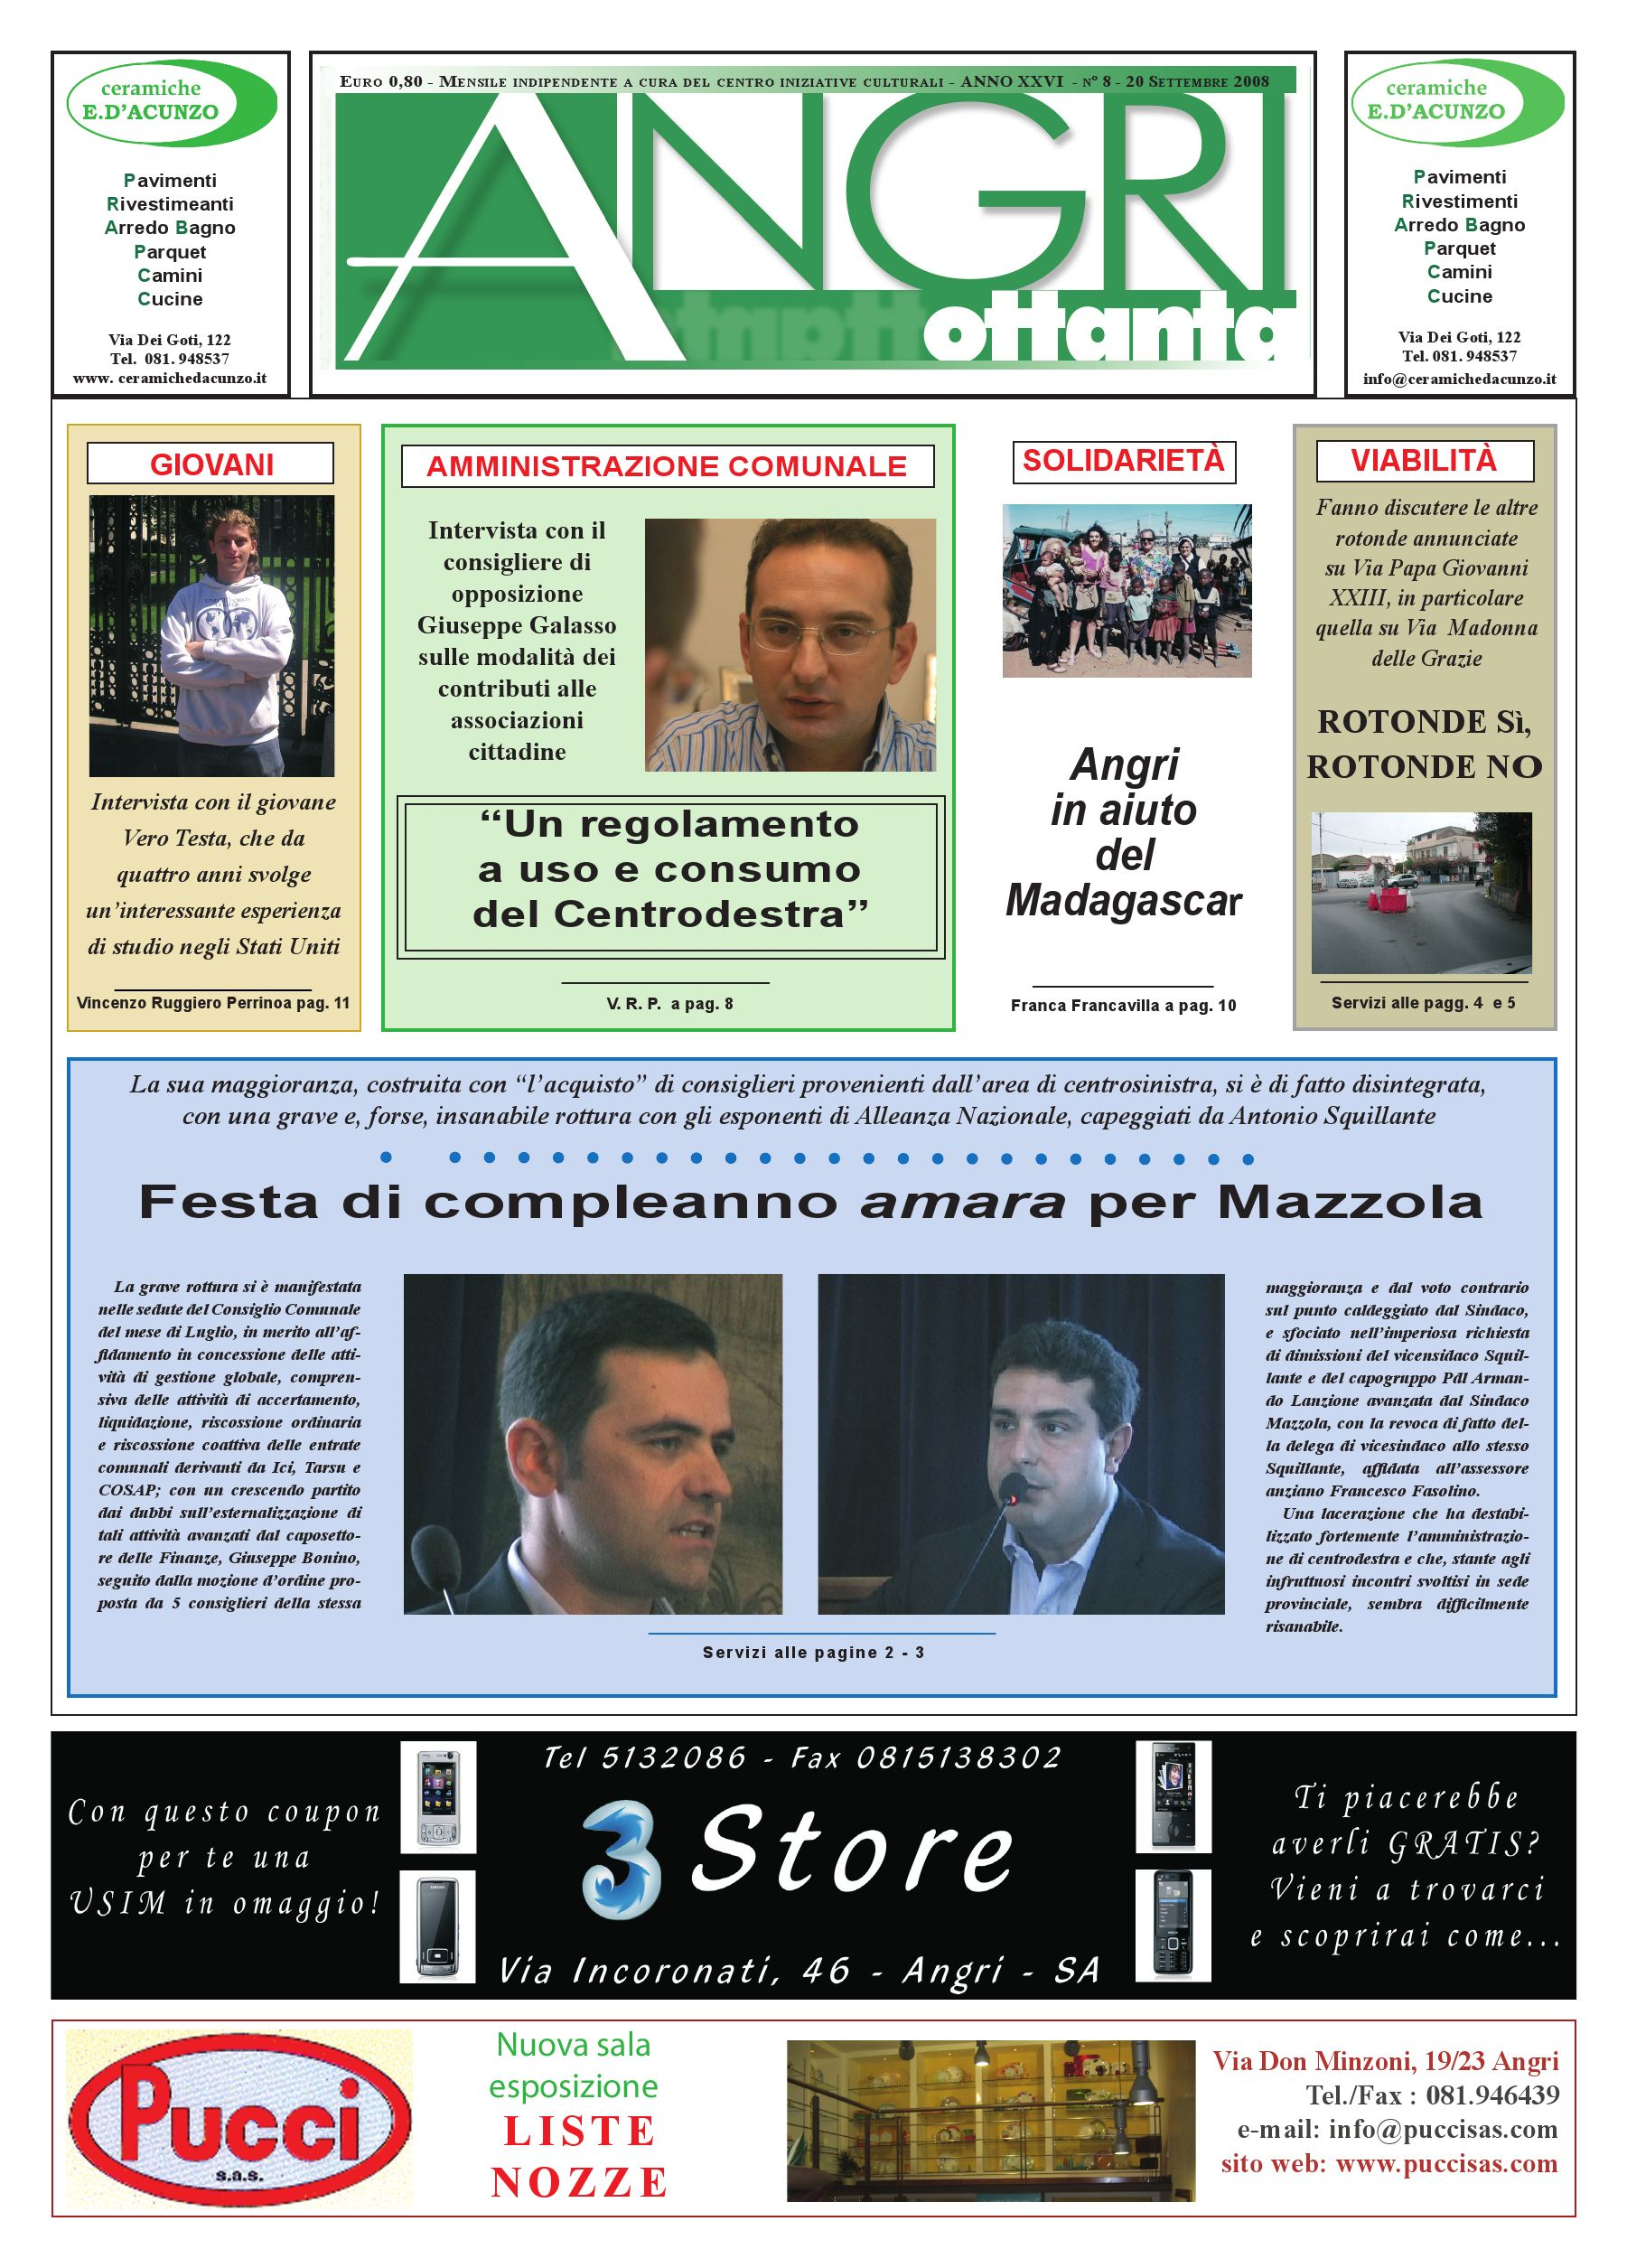 angri80 ott.2008 by piazzadoria piazzadoria - issuu - Arredo Bagno Angri